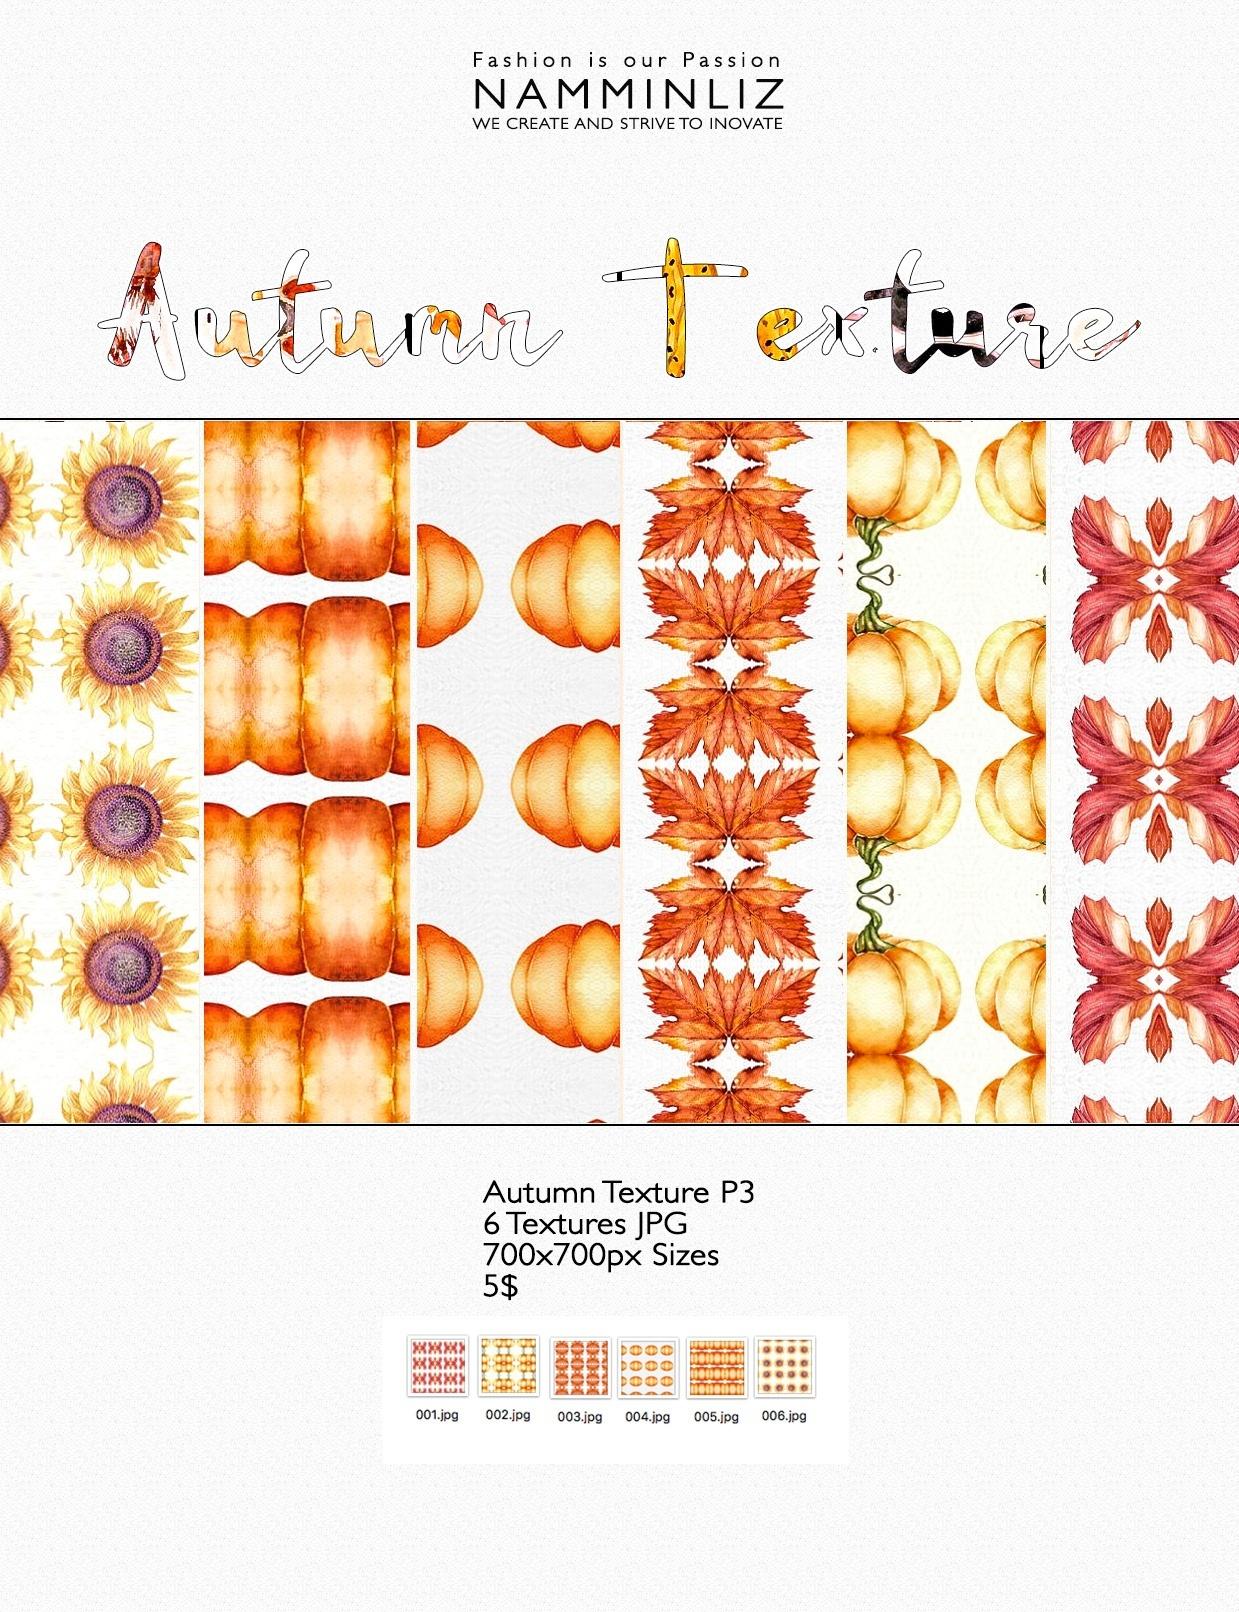 Autumn Texture Full, P1, P2, P3 -  18 Textures JPG 700x700px